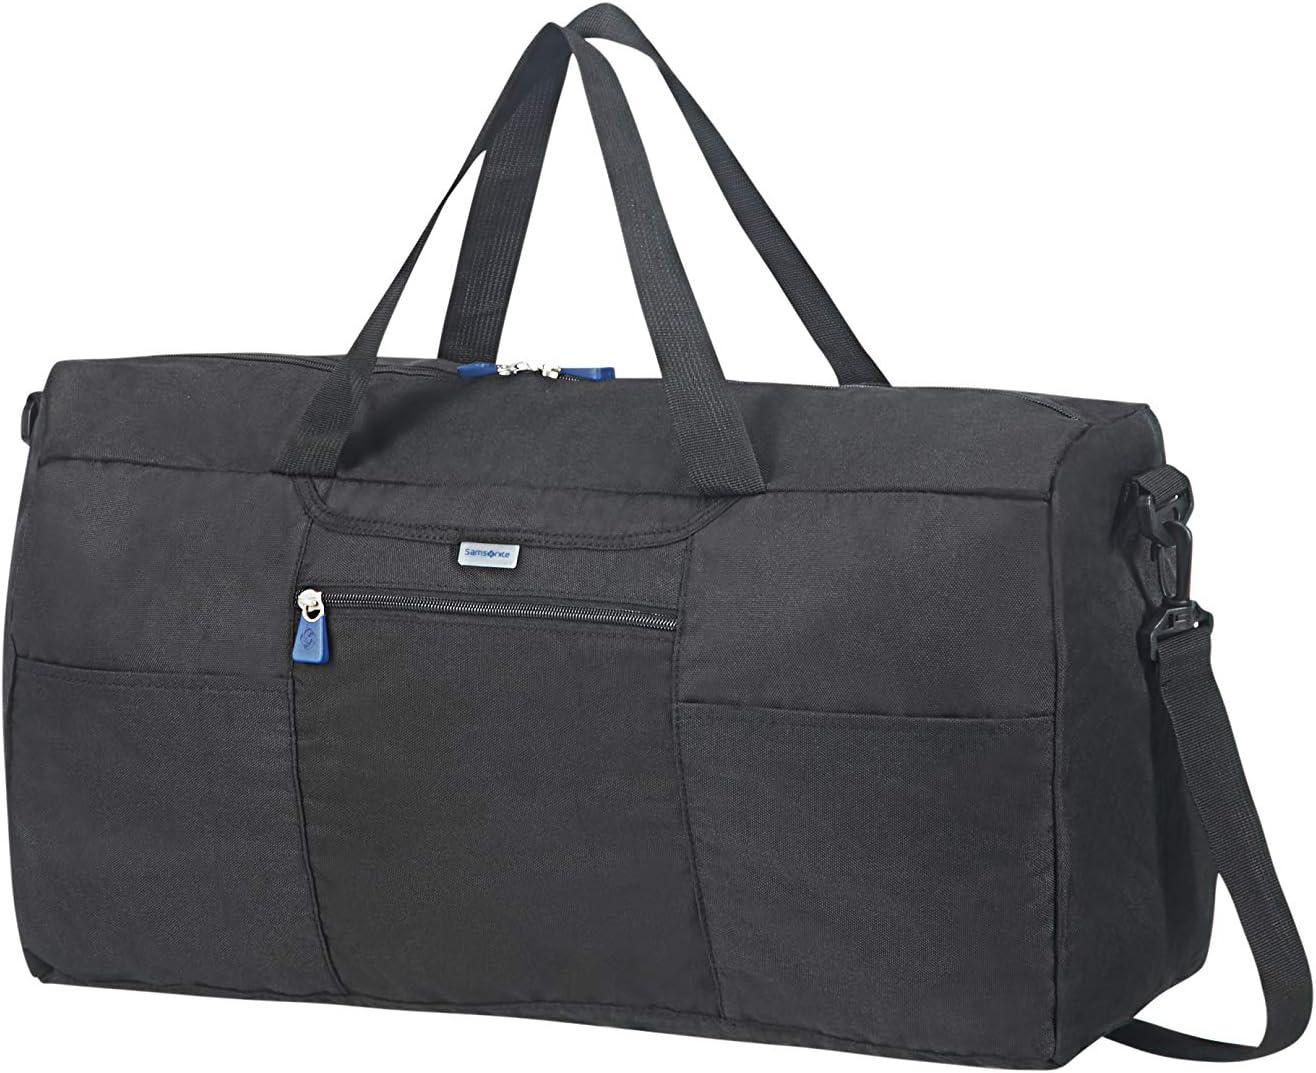 SAMSONITE Global Travel Accessories - Foldable Bolsa de Viaje 55 Centimeters 1 Negro (Black)